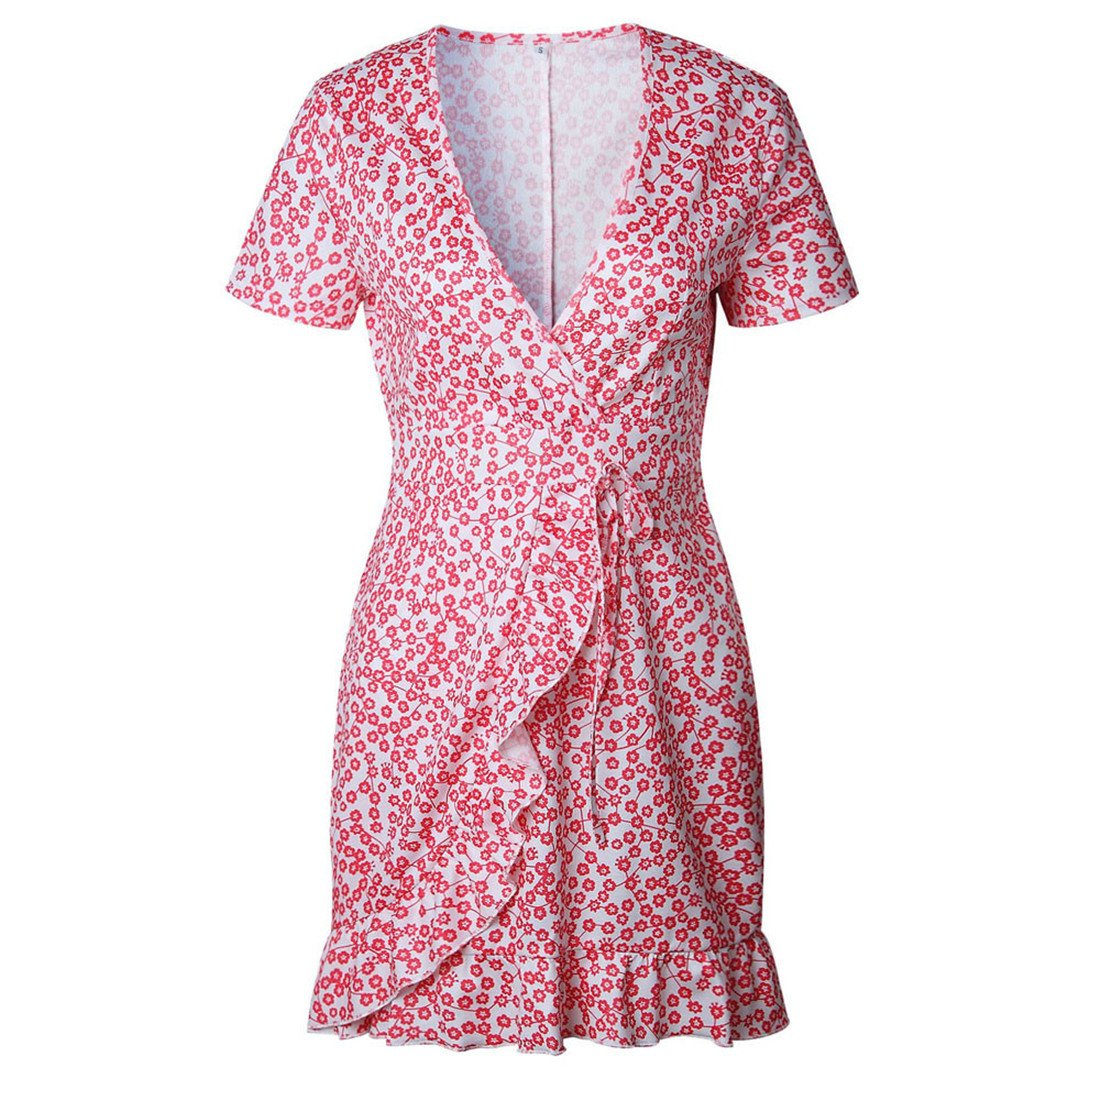 Womens Dresses,Moonuy Girl Short Sleeve V Neck Irregular Floral Mini Evening Party Dress Clubwear Elegant Loose Playsuit Jumpsuits Beach Dress For Ladies ...